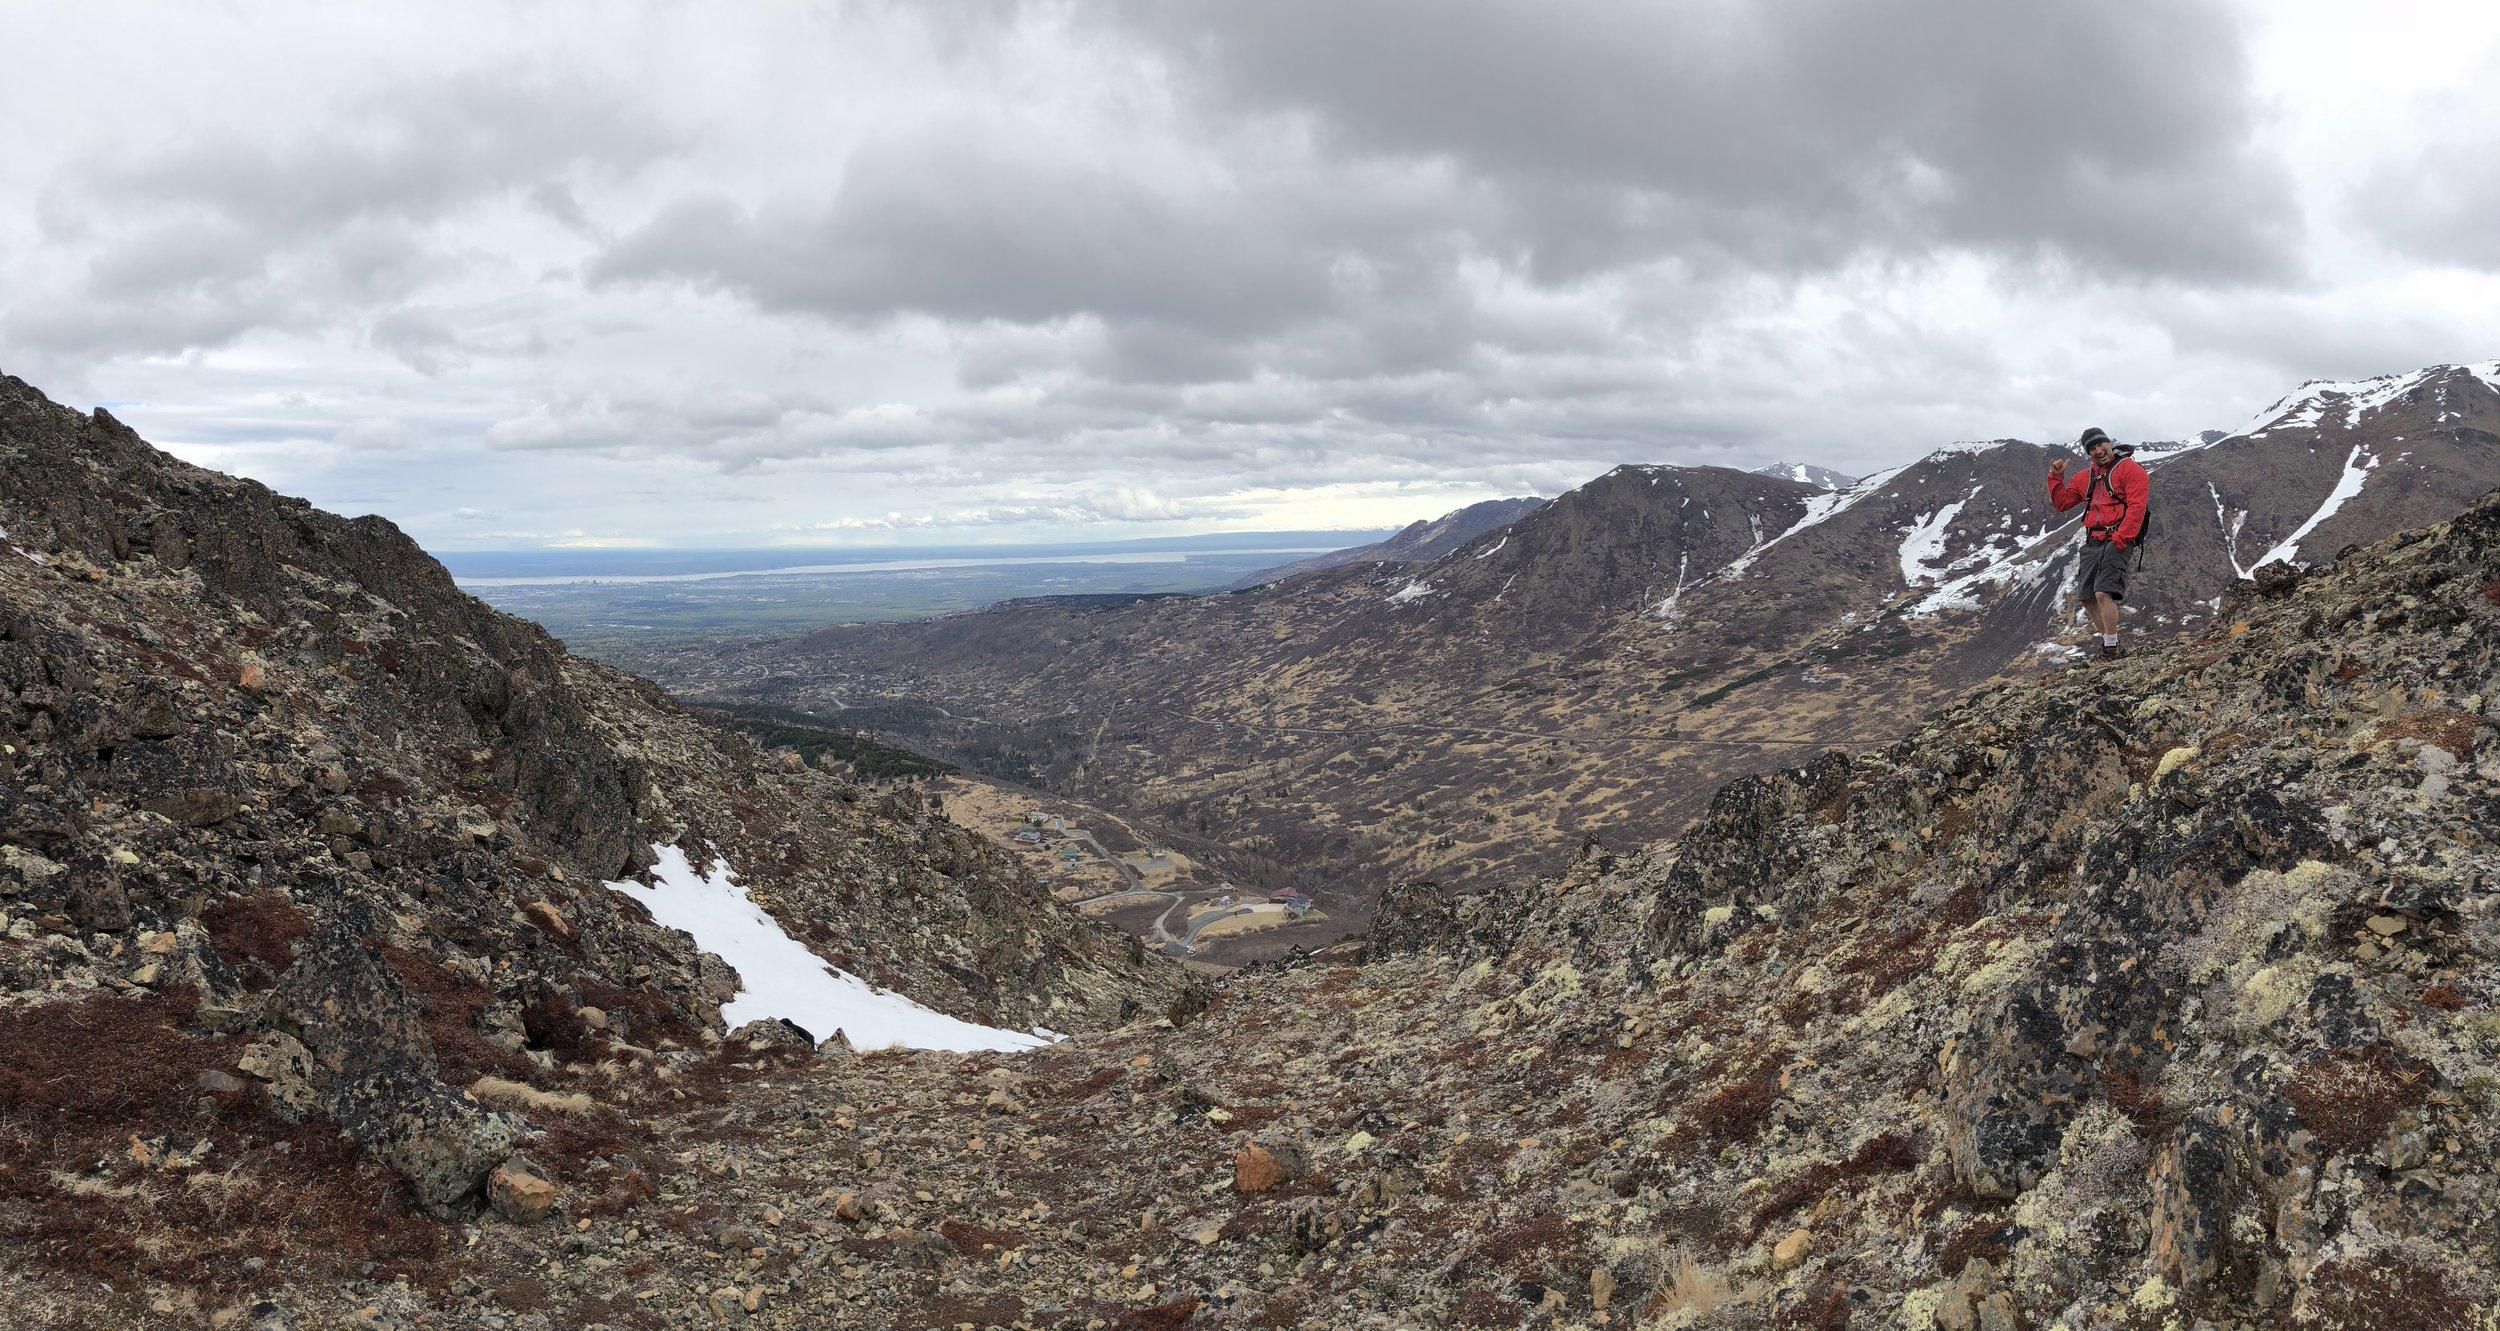 2018-05-19 McHugh Peak 022.JPG